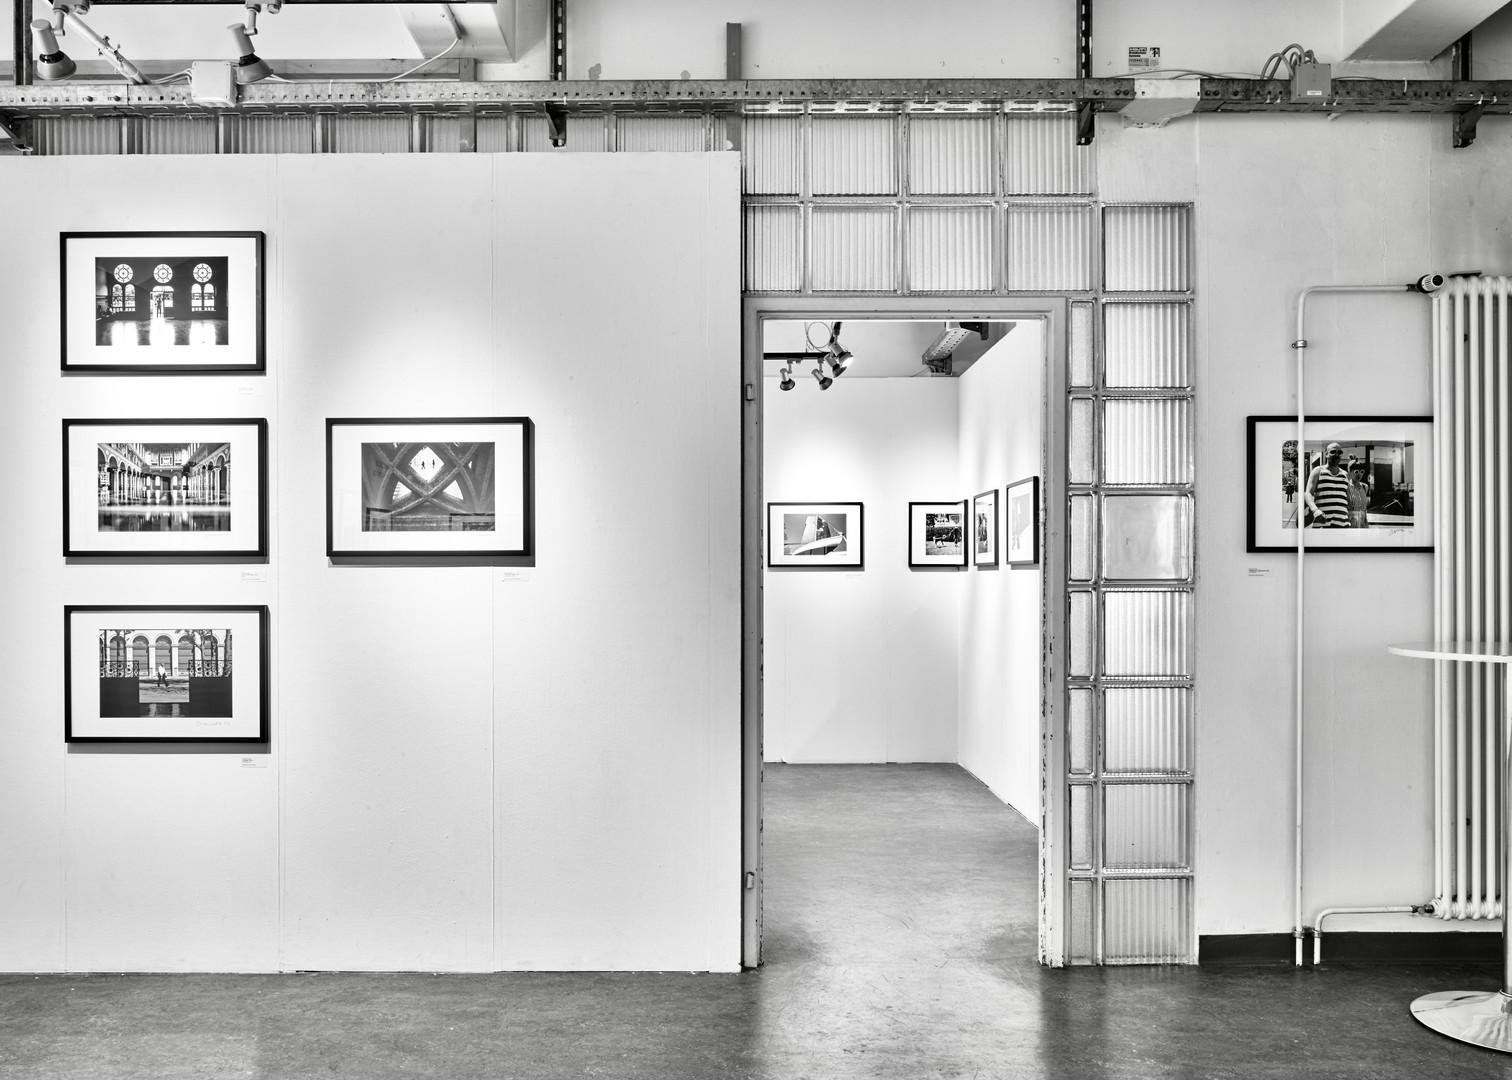 007_Ausstellung_10.jpg